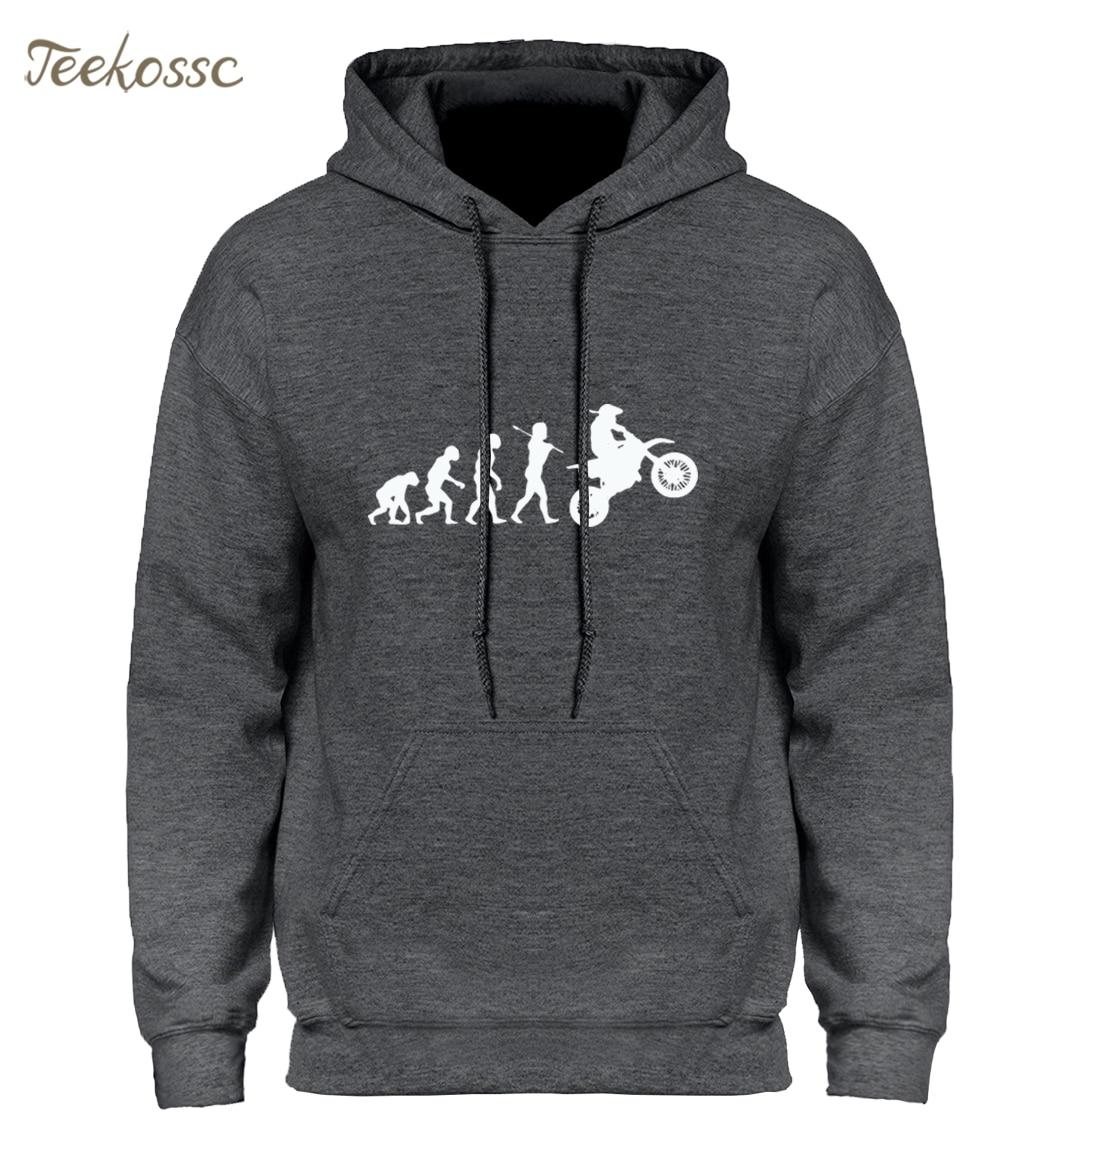 Dirtbike Evolution Motocross Hoodie Hoodies Sweatshirt Men Winter Autumn Hooded Hoody Homens Hip Hop Black White High Quality